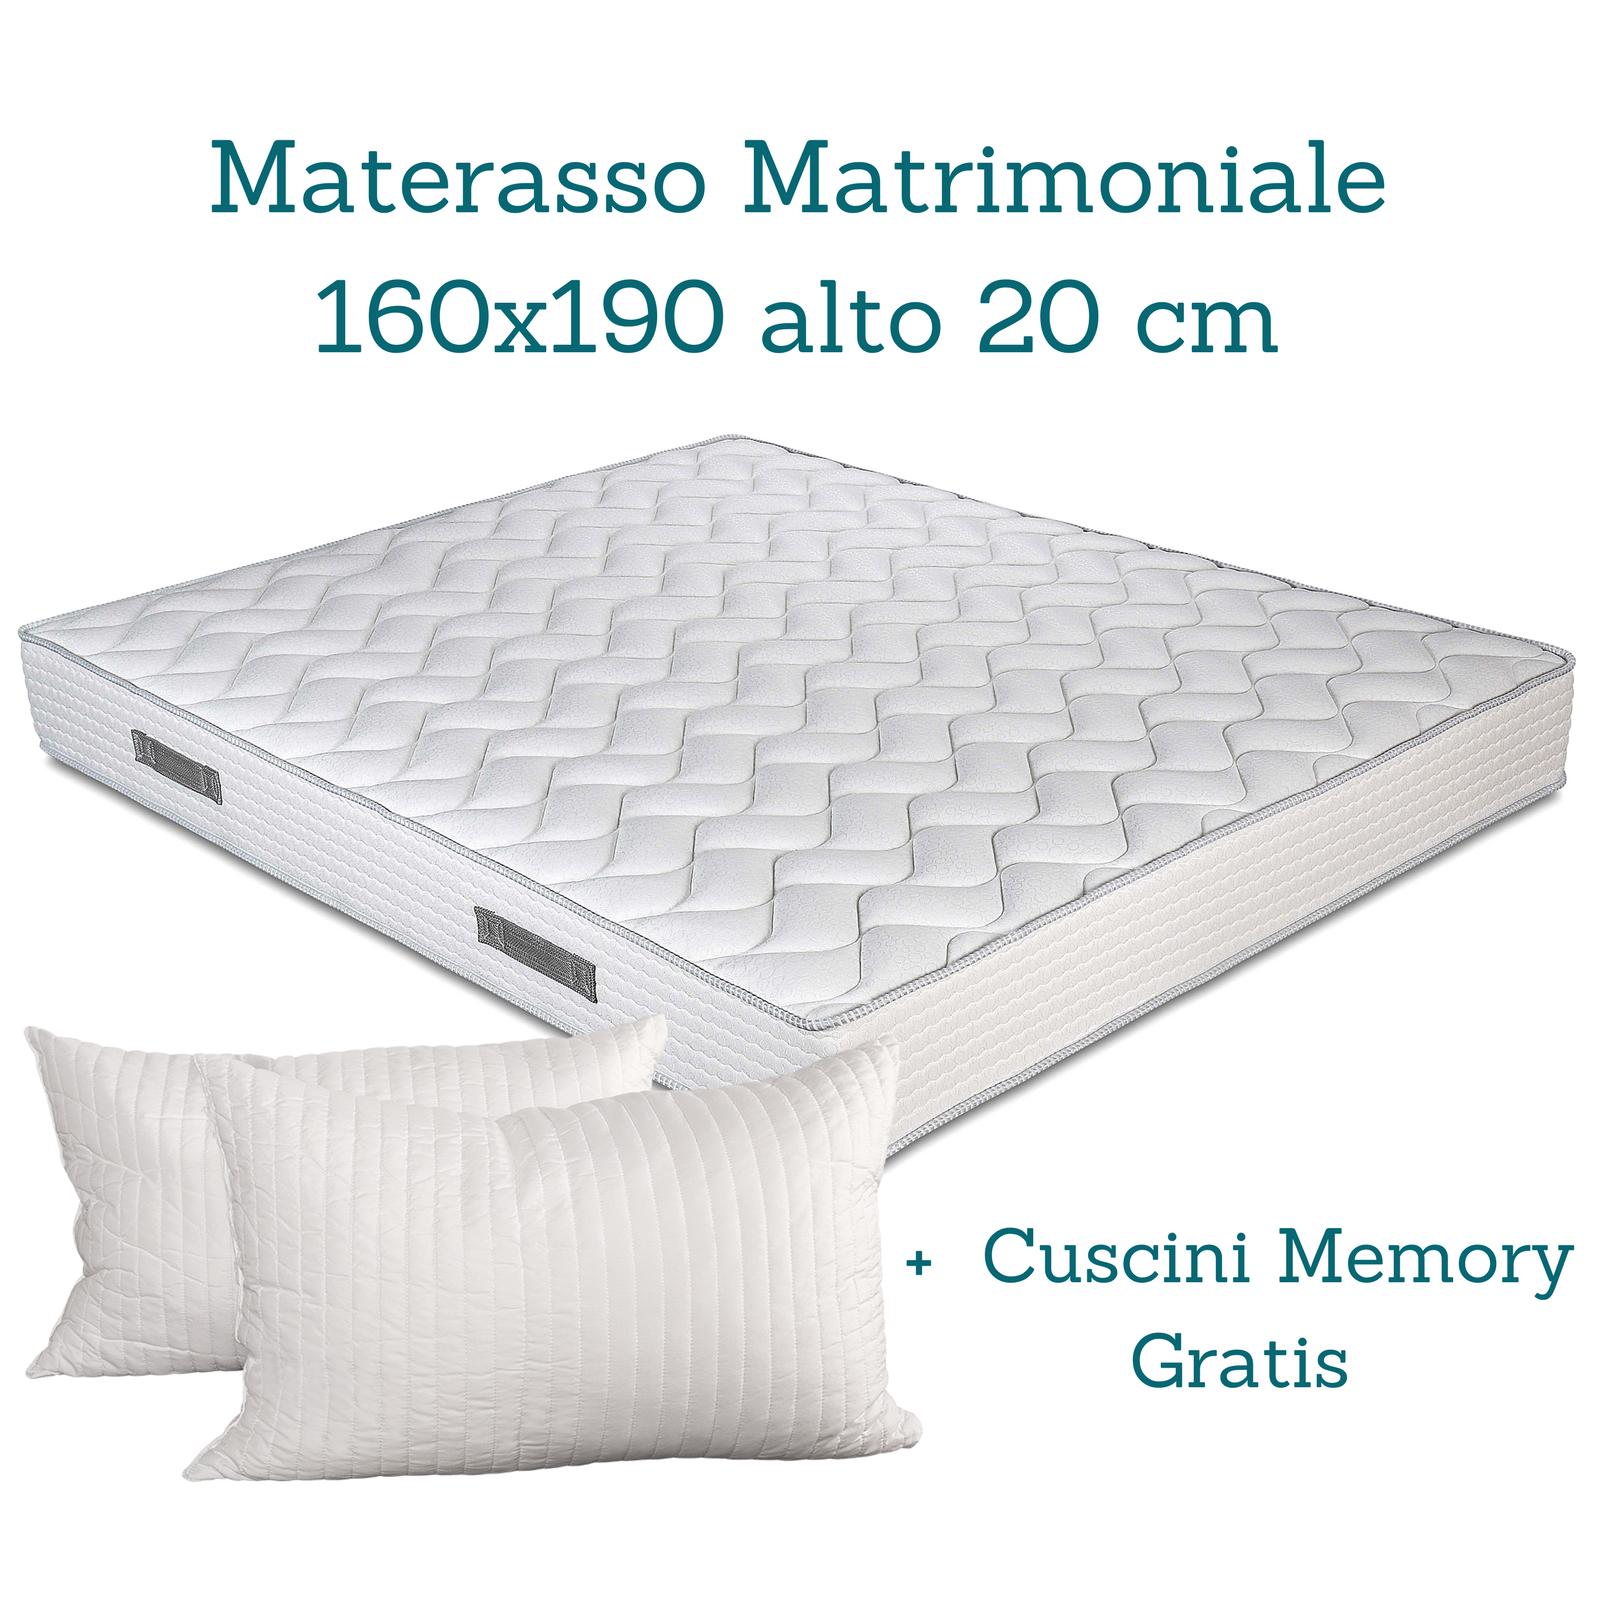 KIT Materasso Materasso Materasso Waterfoam, Rete Ferro a Doghe in Faggio +Cuscini MemoryFoam GRATIS c04484